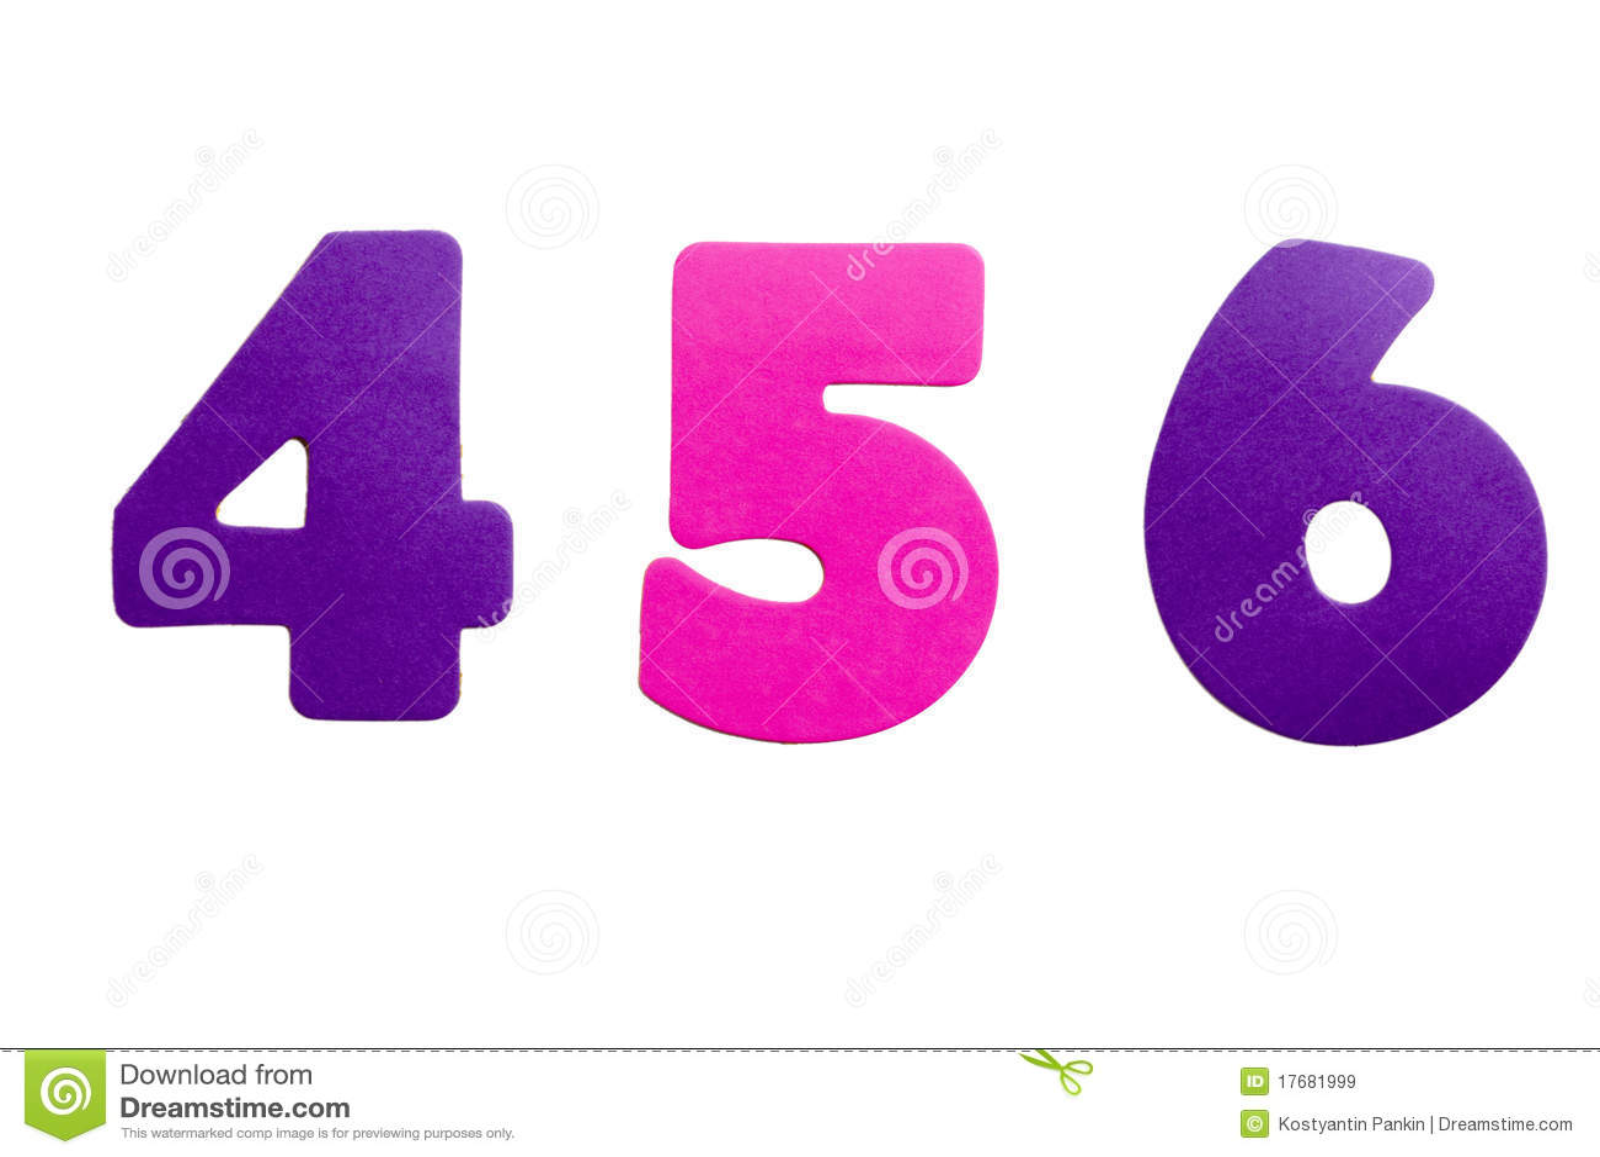 Number 456